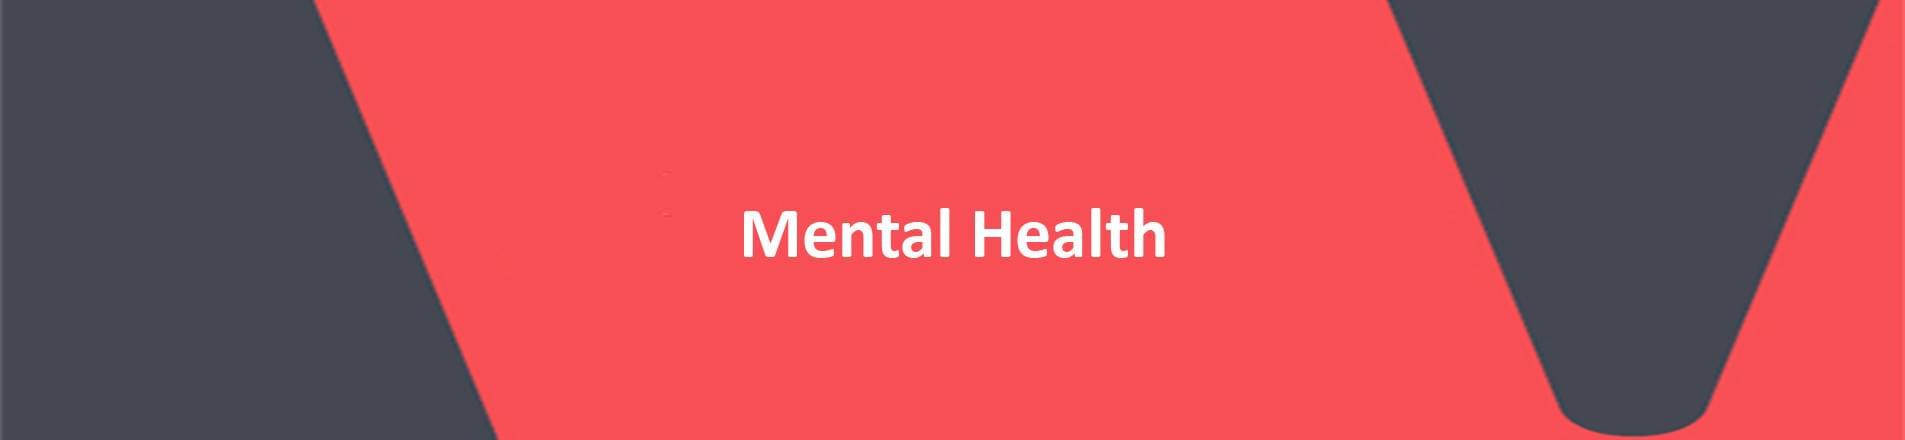 Words Mental health on red VERCIDA branded background